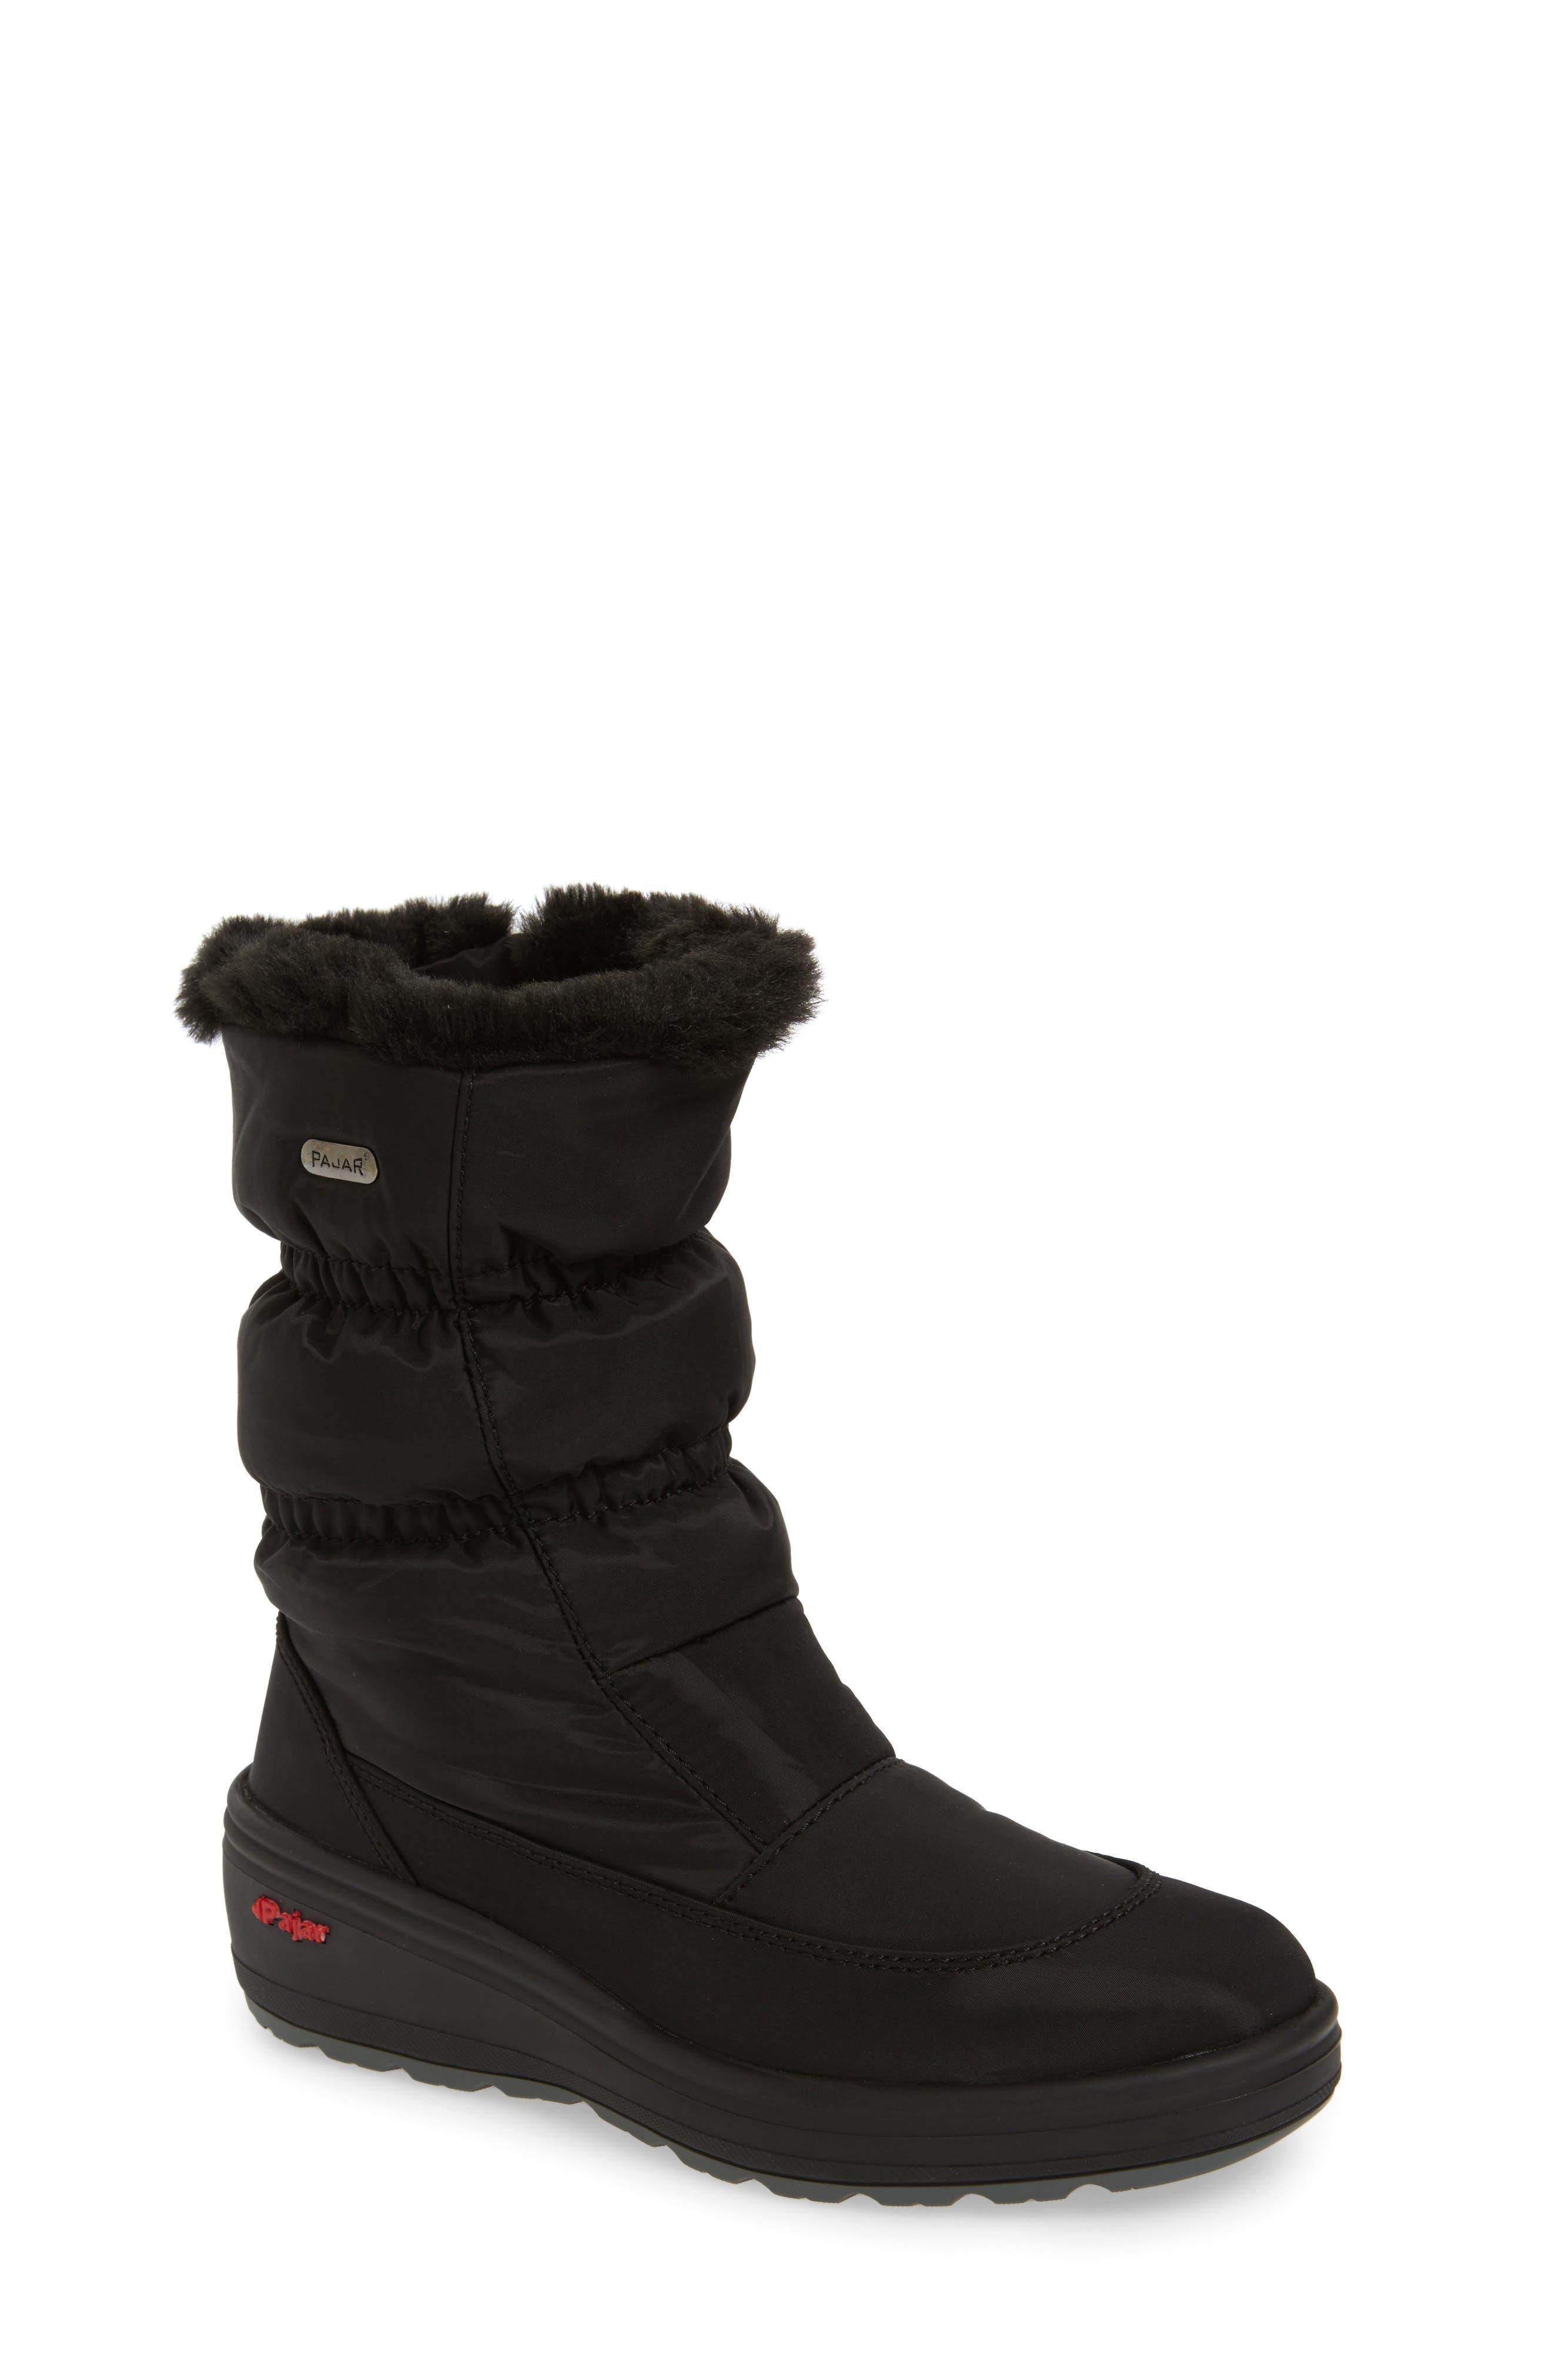 Snowcap Waterproof Insulated Winter Boot,                             Main thumbnail 1, color,                             BLACK FABRIC